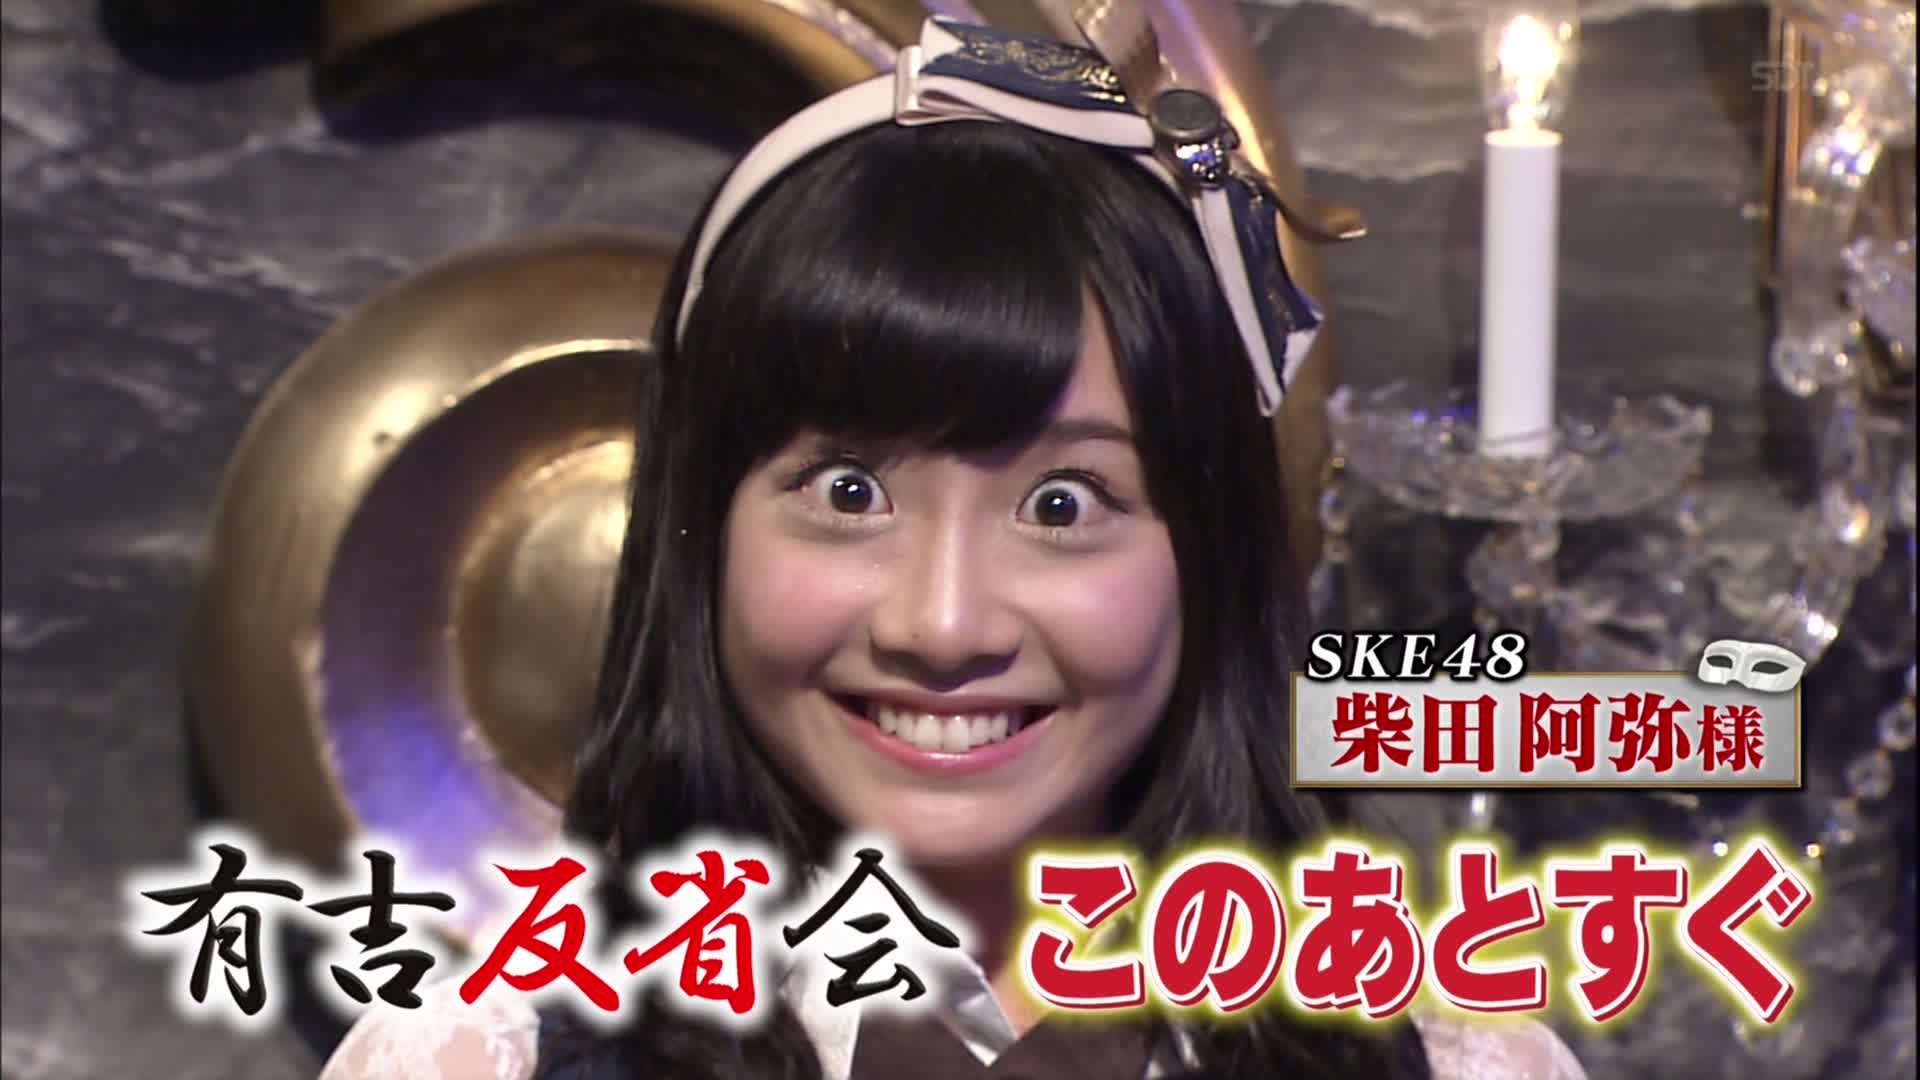 everyの踊る白雪姫★鈴江奈々☆Dance43 [転載禁止]©2ch.netYouTube動画>3本 ->画像>1307枚